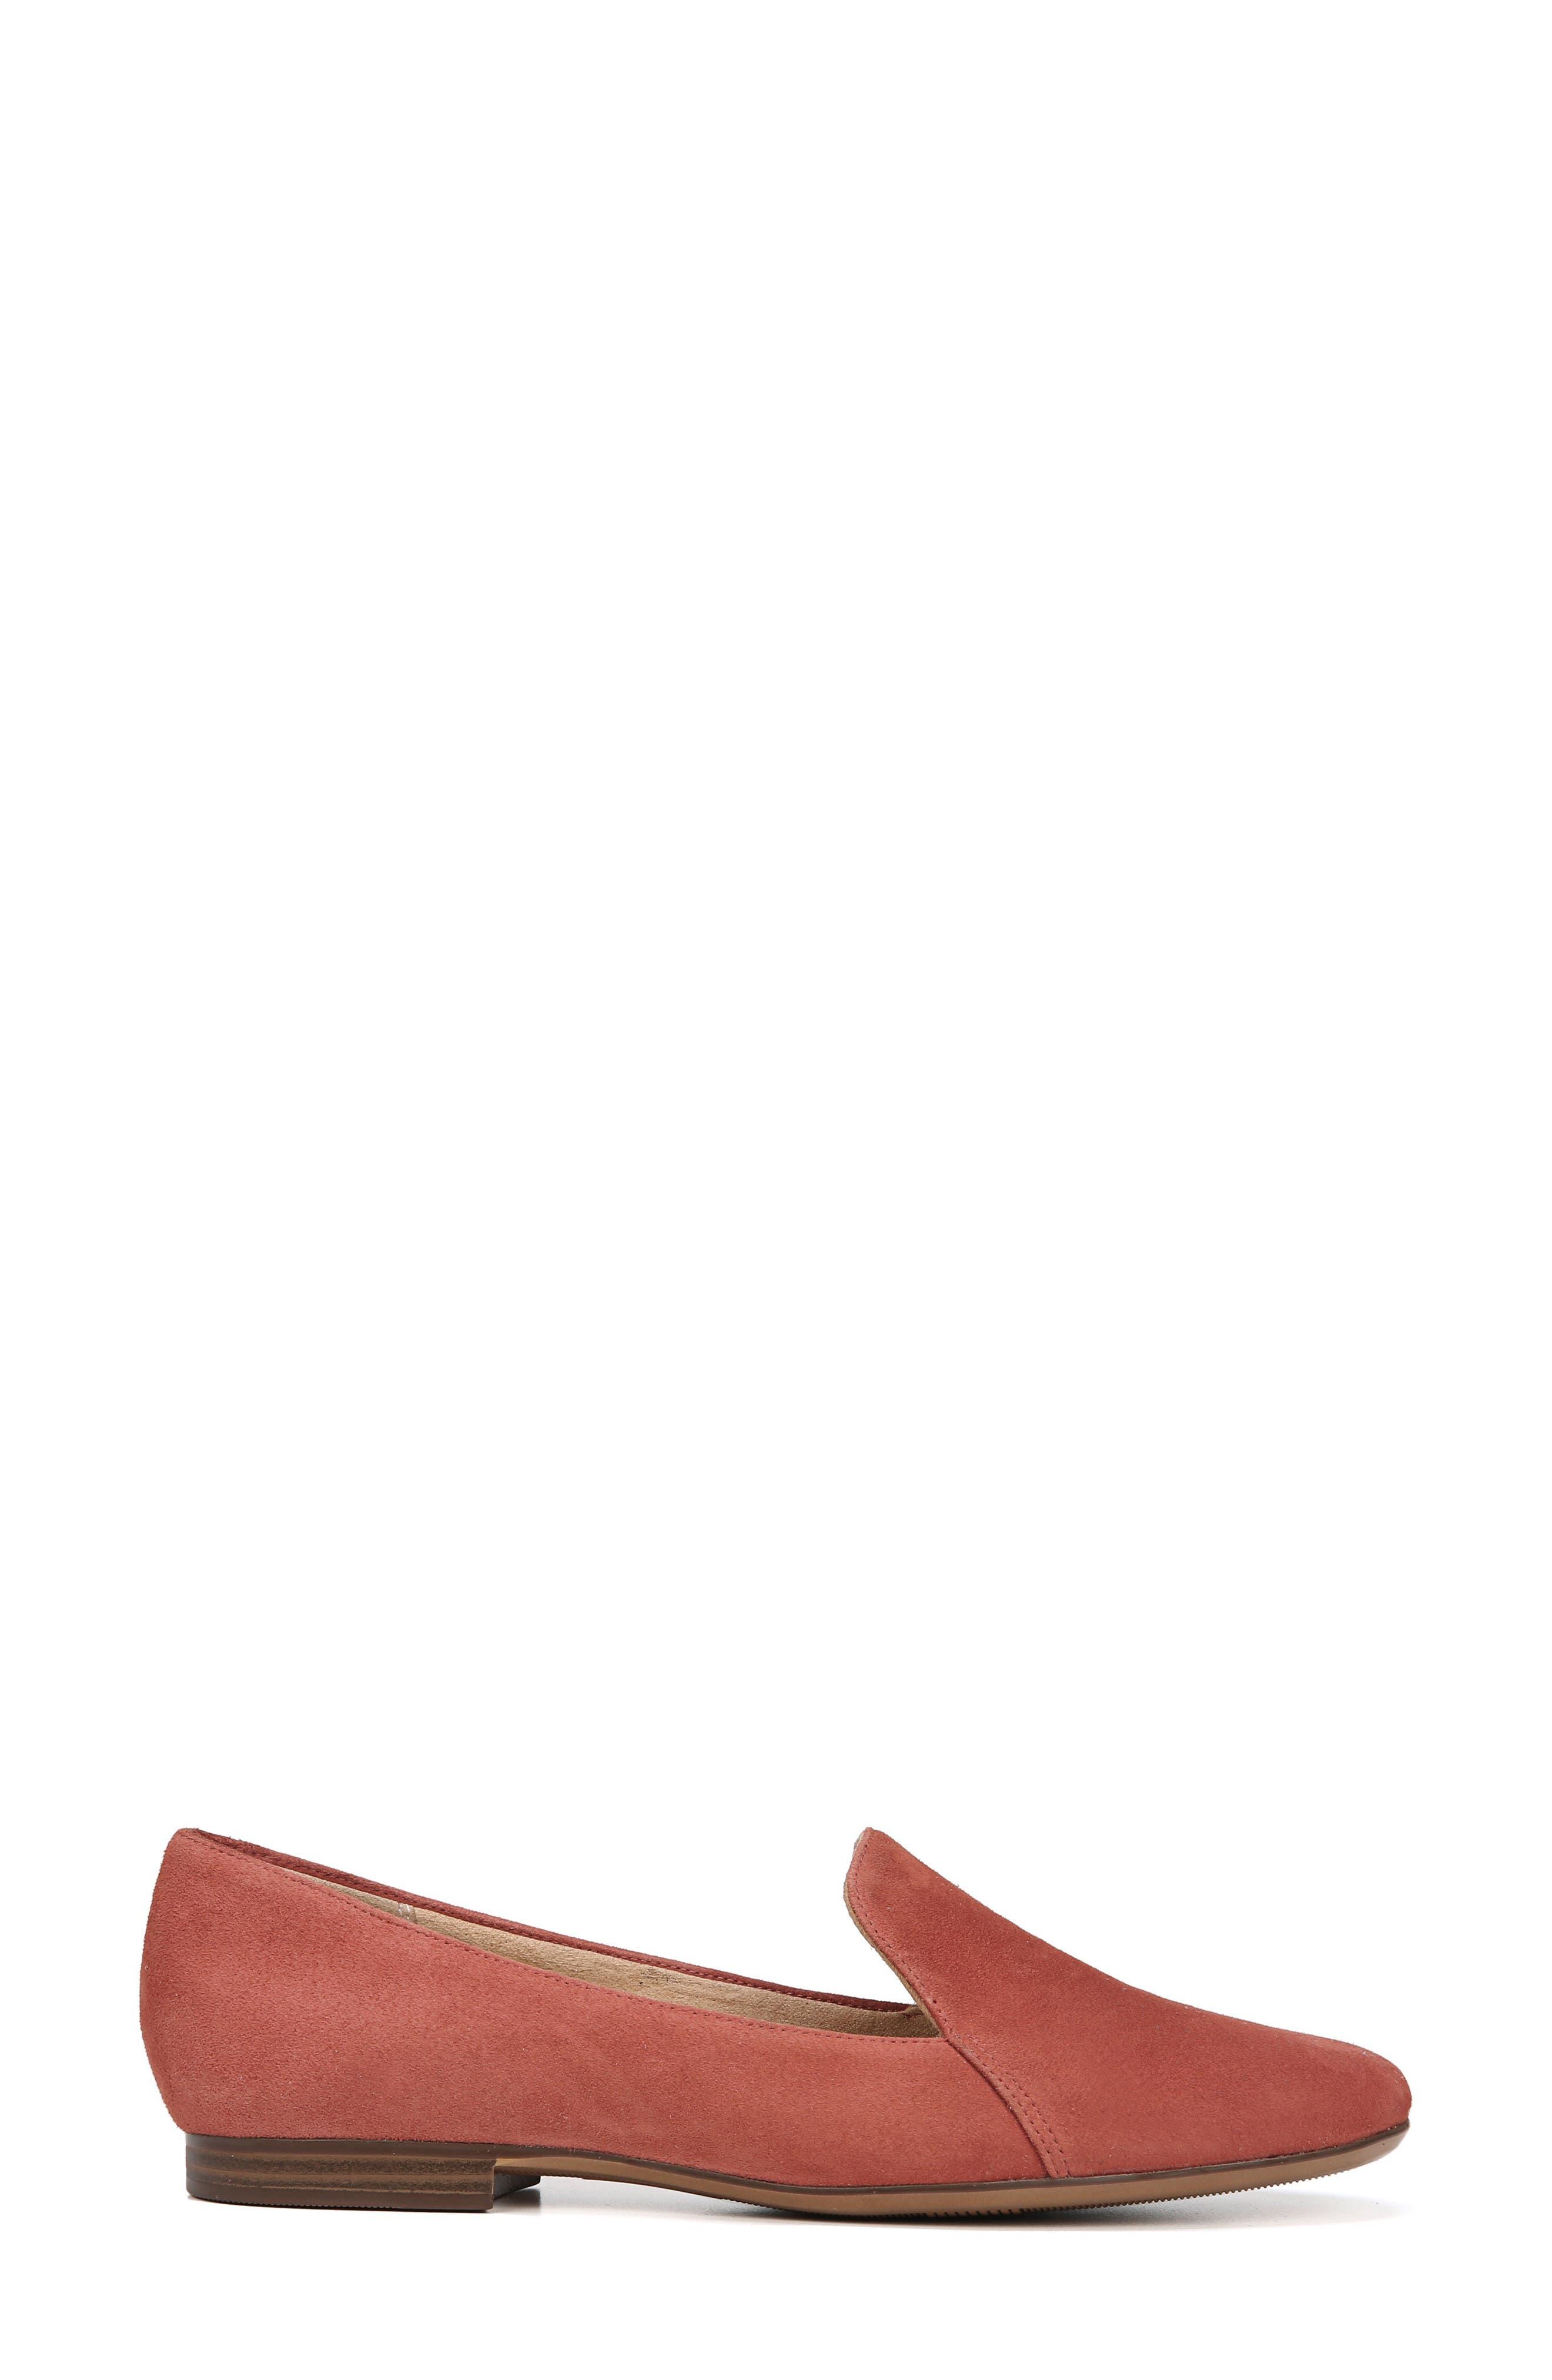 Emiline Flat Loafer,                             Alternate thumbnail 3, color,                             DESERT CLAY SUEDE